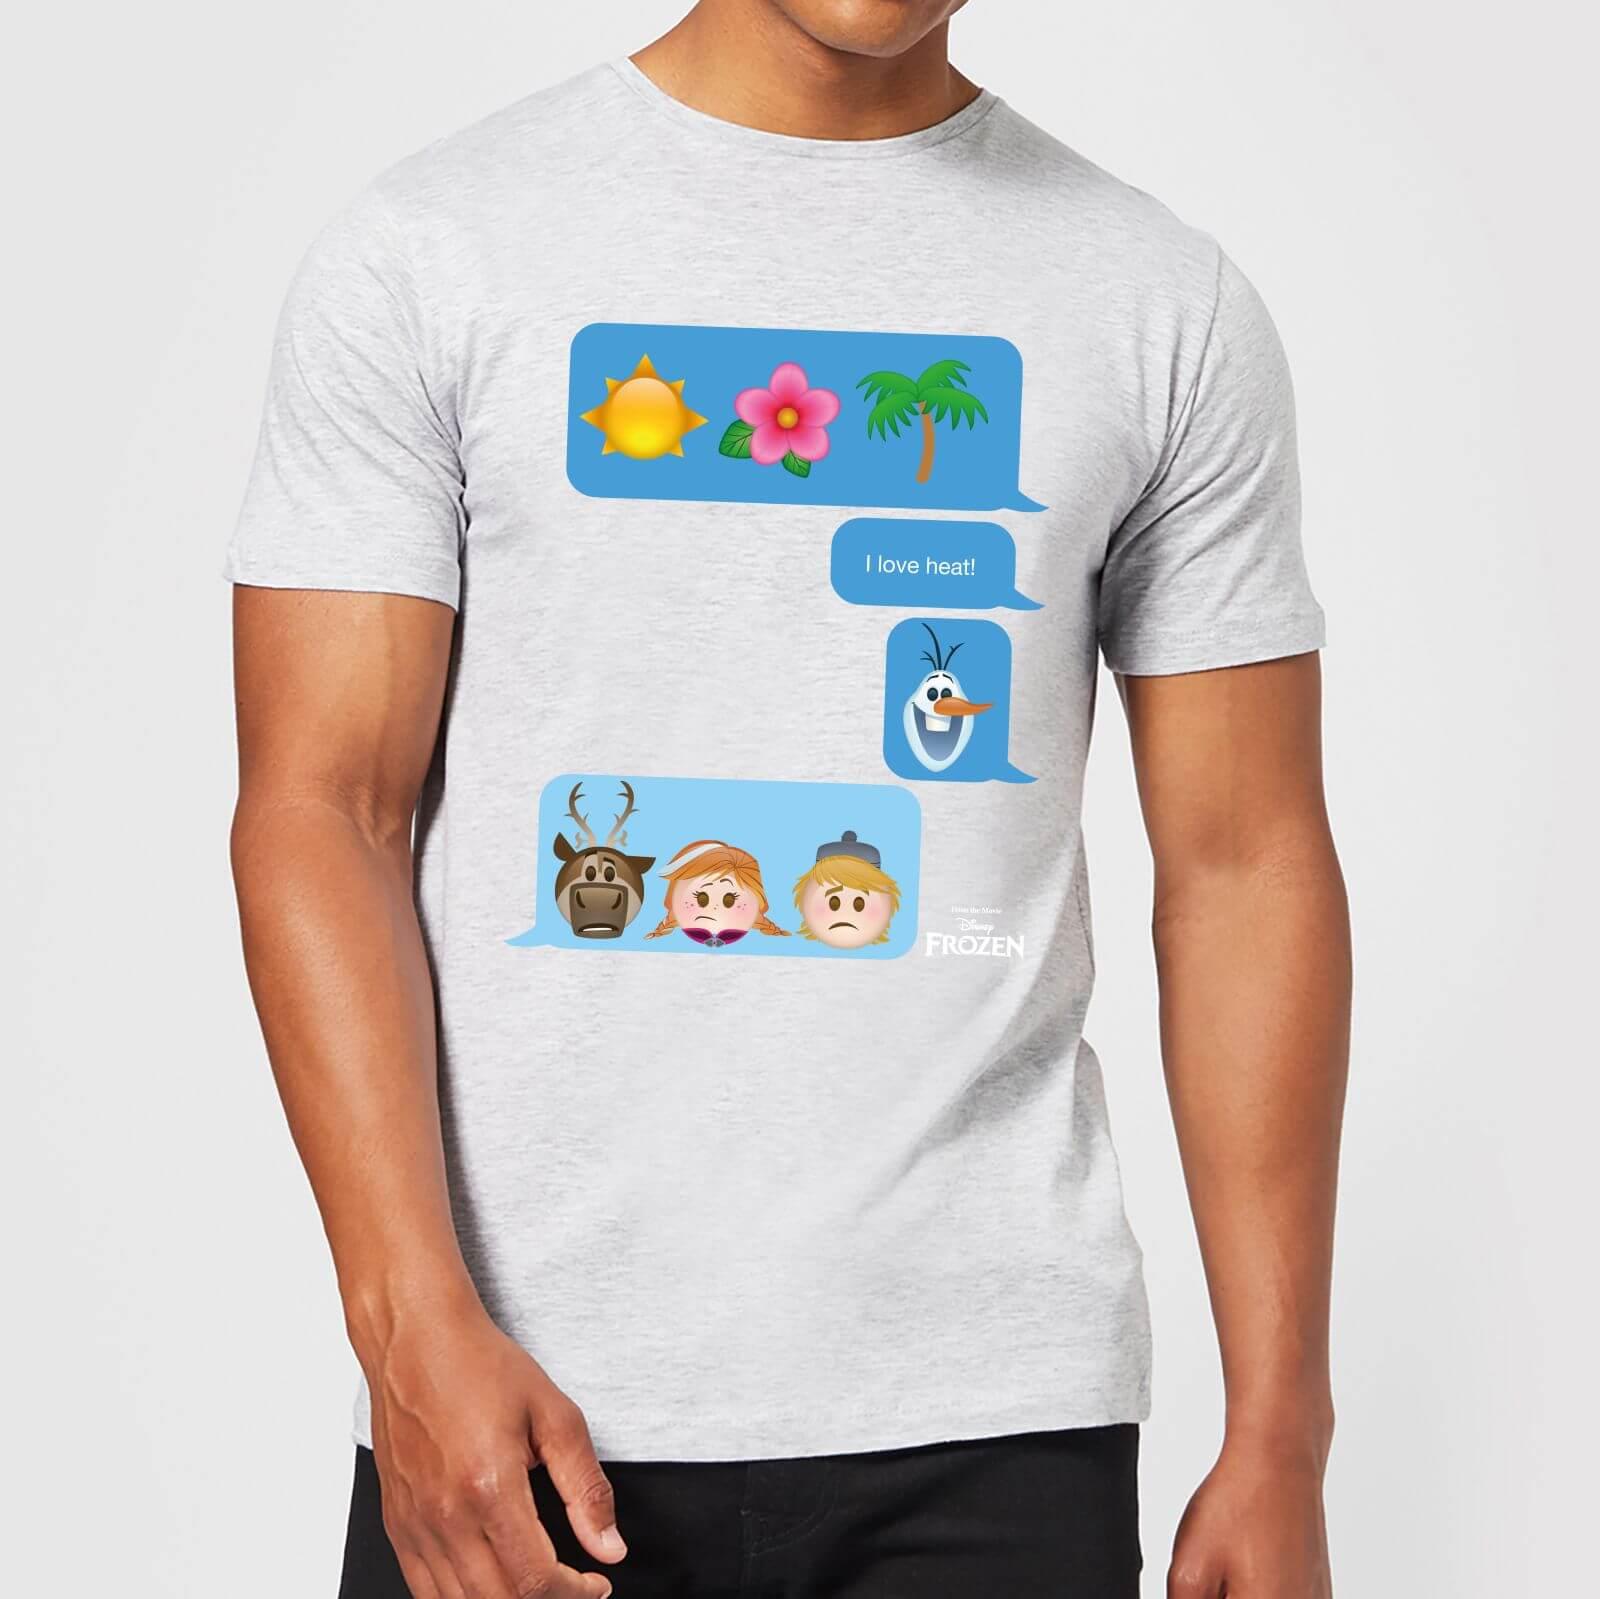 Disney Disney Frozen I Love Heat Emoji Men's T-Shirt - Grey - 3XL - Grey